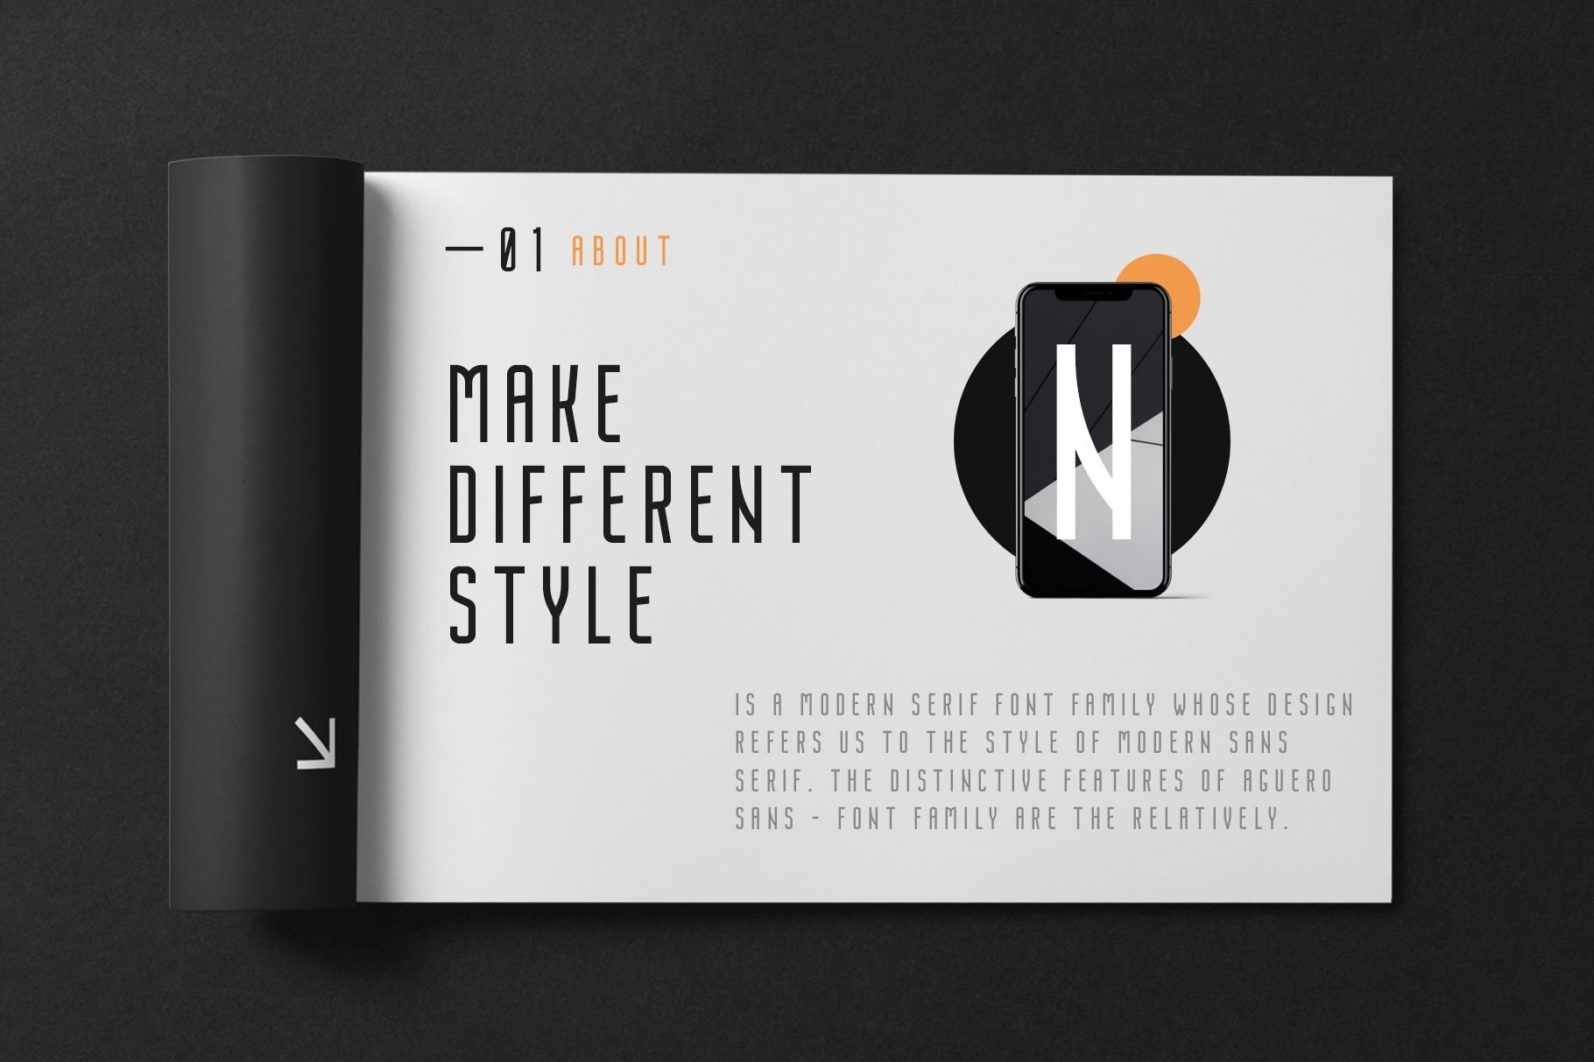 Nordin - Condensed Sans Serif Font - 05 1 1 -